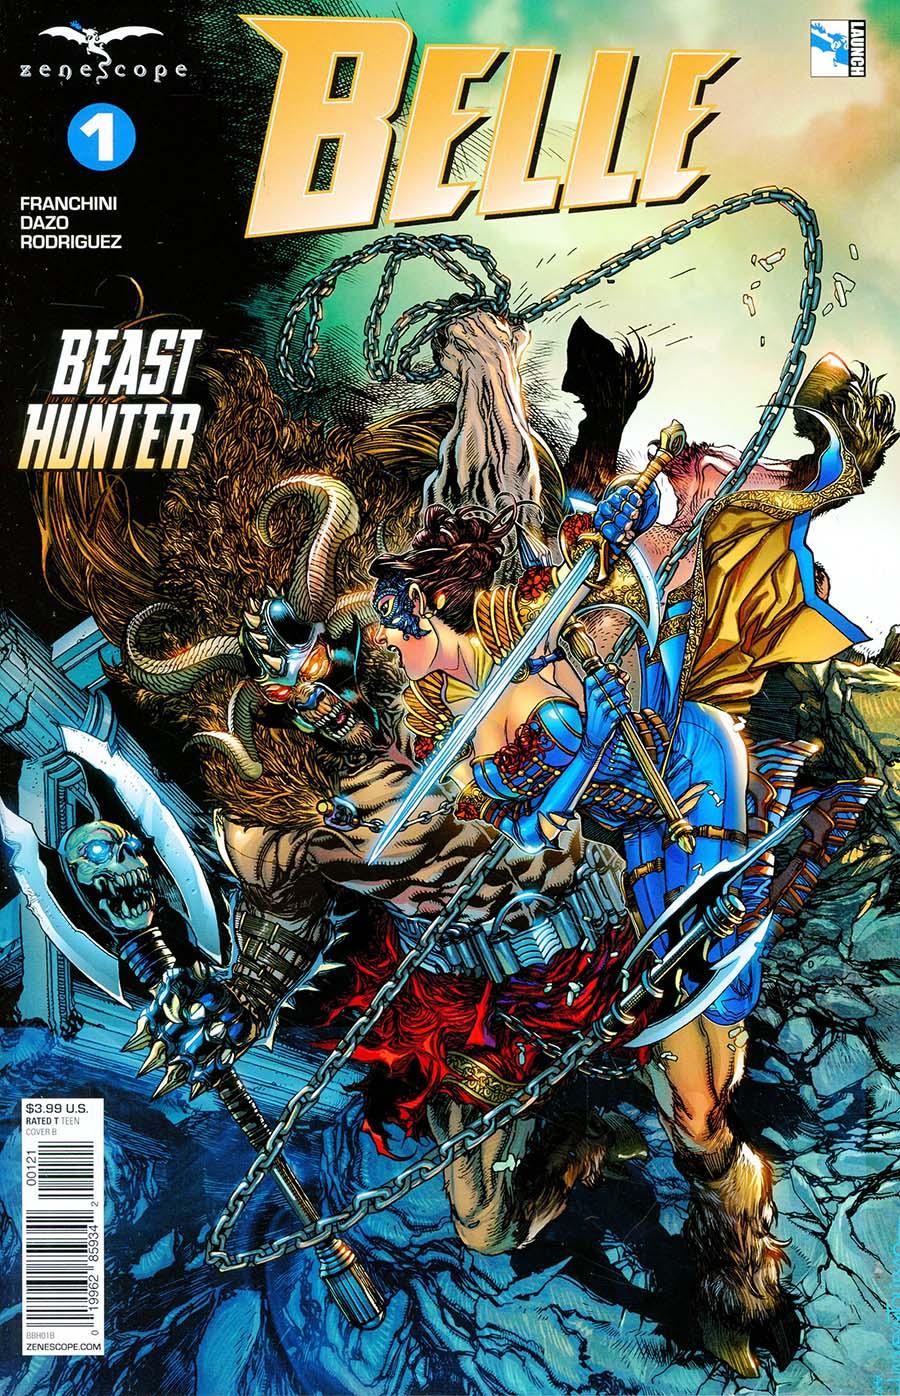 Grimm Fairy Tales Presents Belle Beast Hunter #1 Cover B Harvey Tolibao